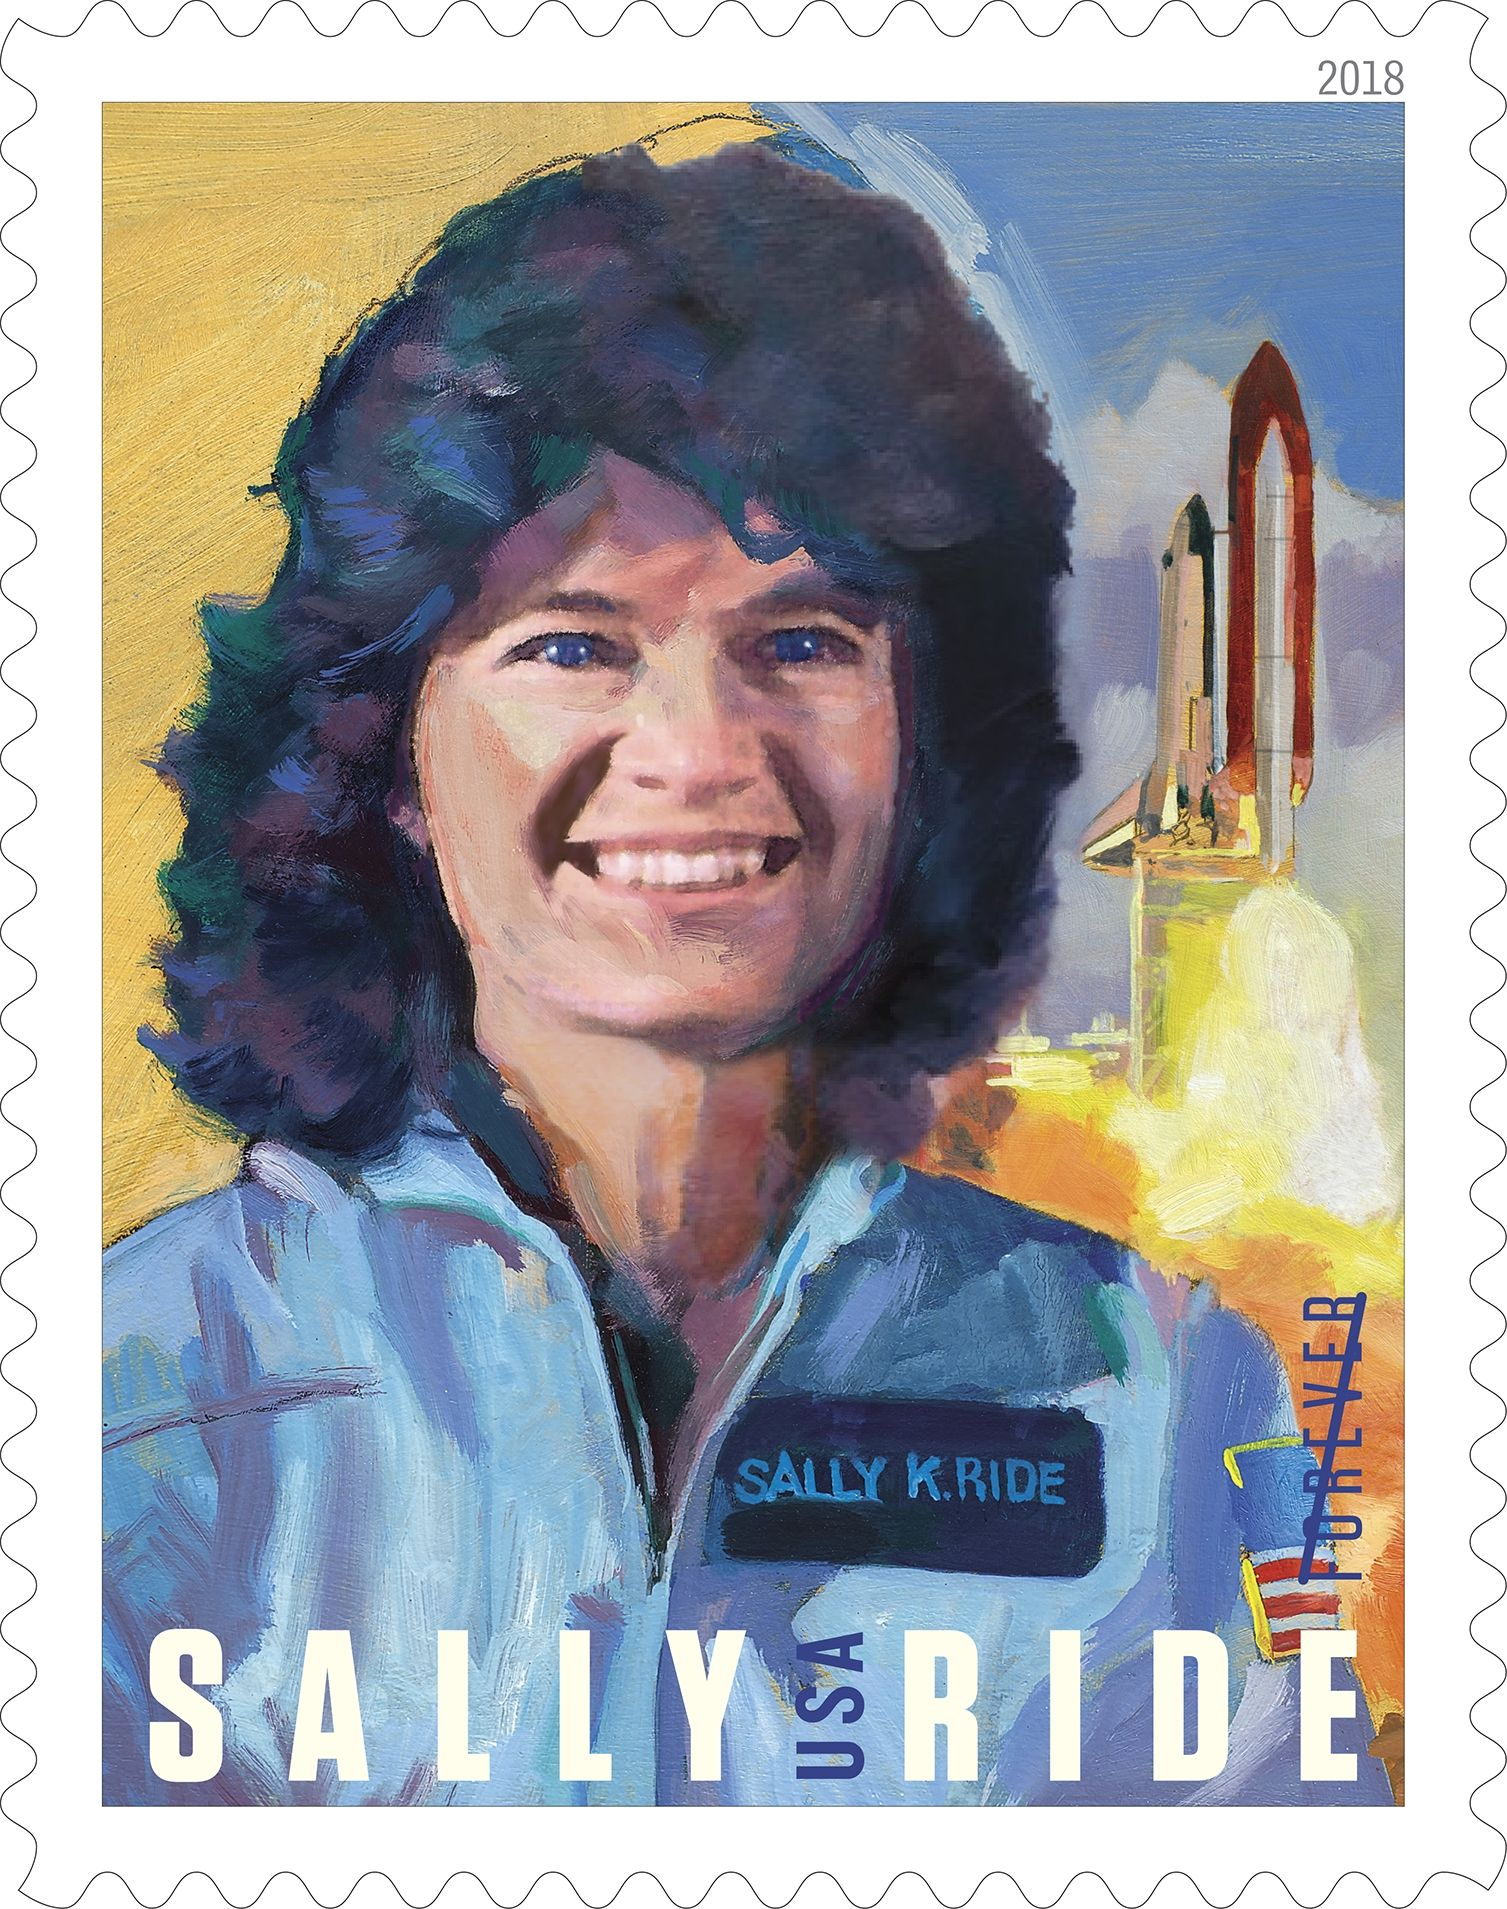 05_25_Sally_Ride_stamp